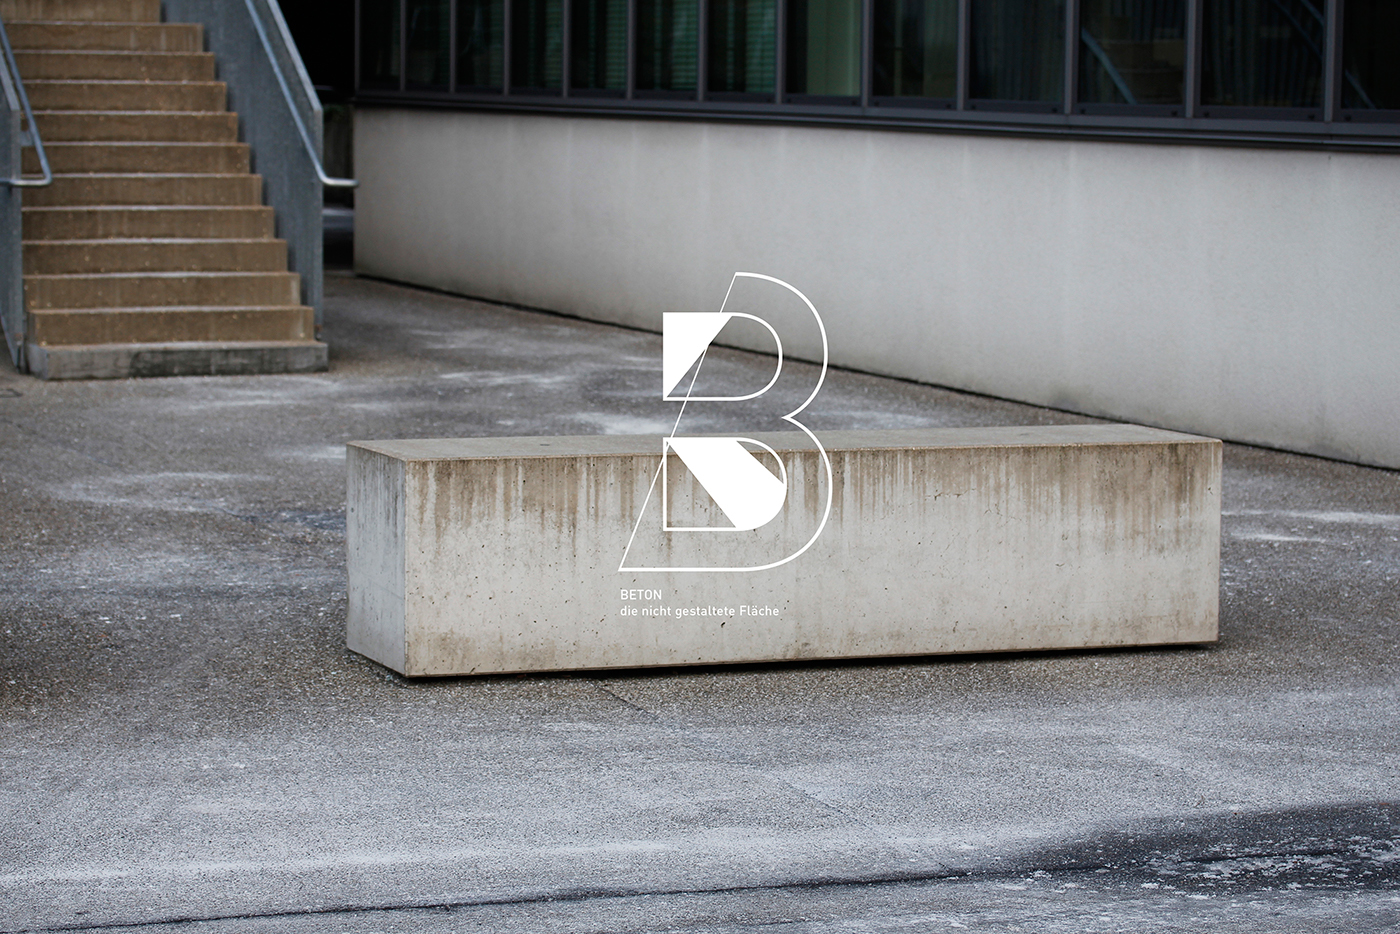 beton concrete photo foto